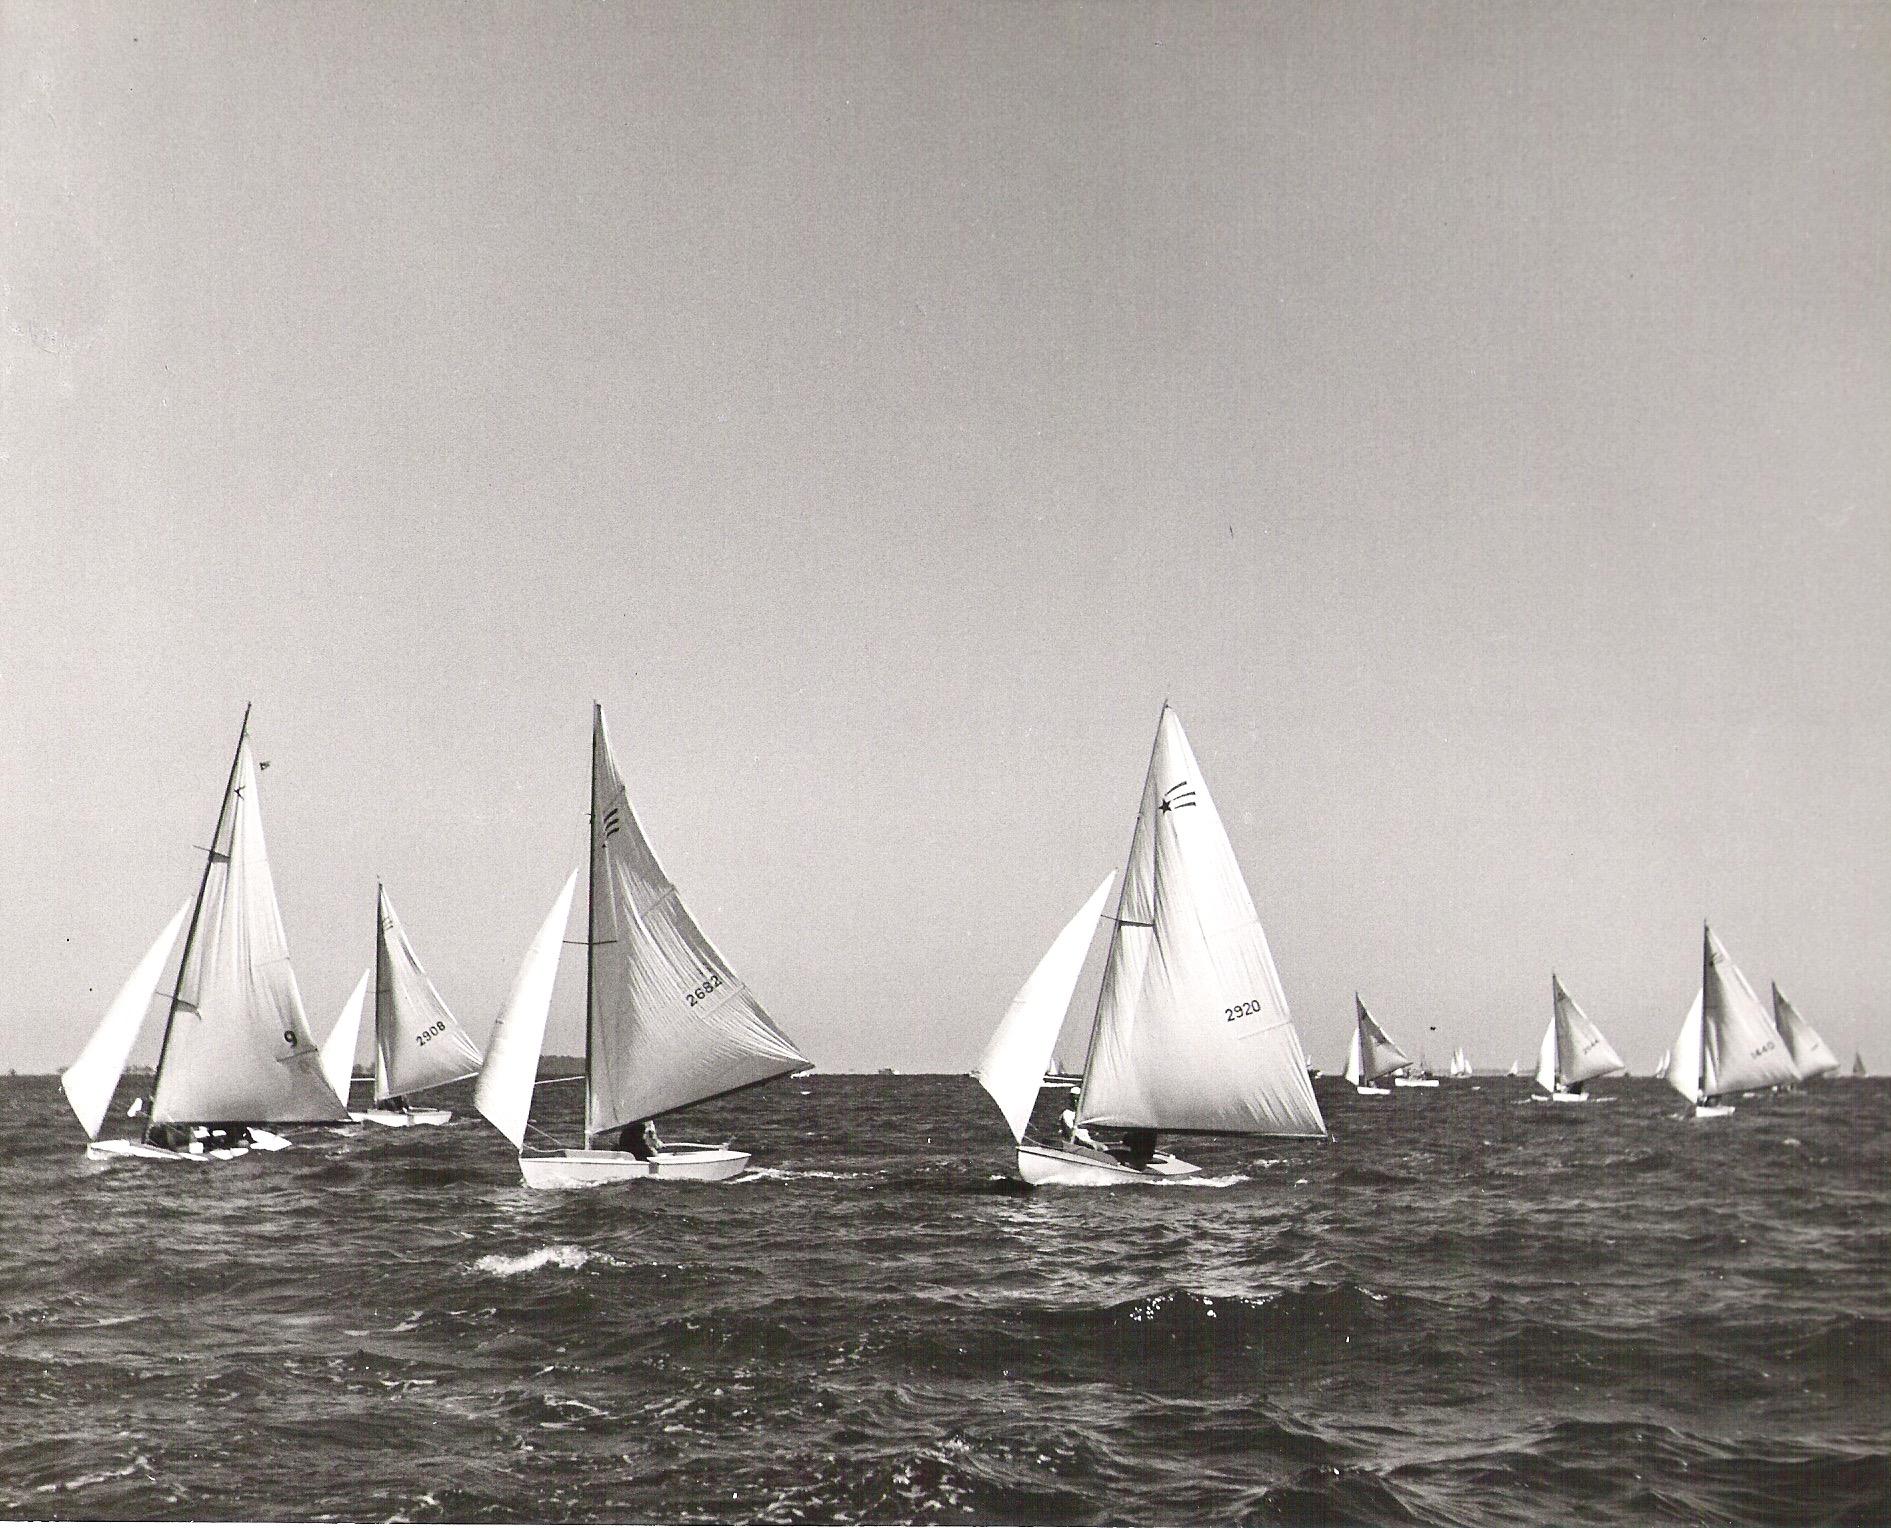 Photos courtesy Constance Stuart Larrabee/Chesapeake Bay Maritime Museum